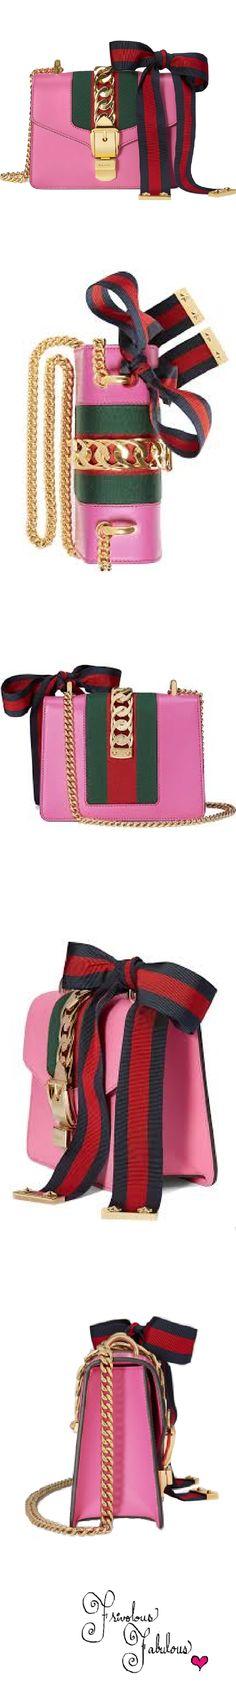 Frivolous Fabulous - Gucci Hot Pink Sylvie Hand Bag Spring Summer 2016